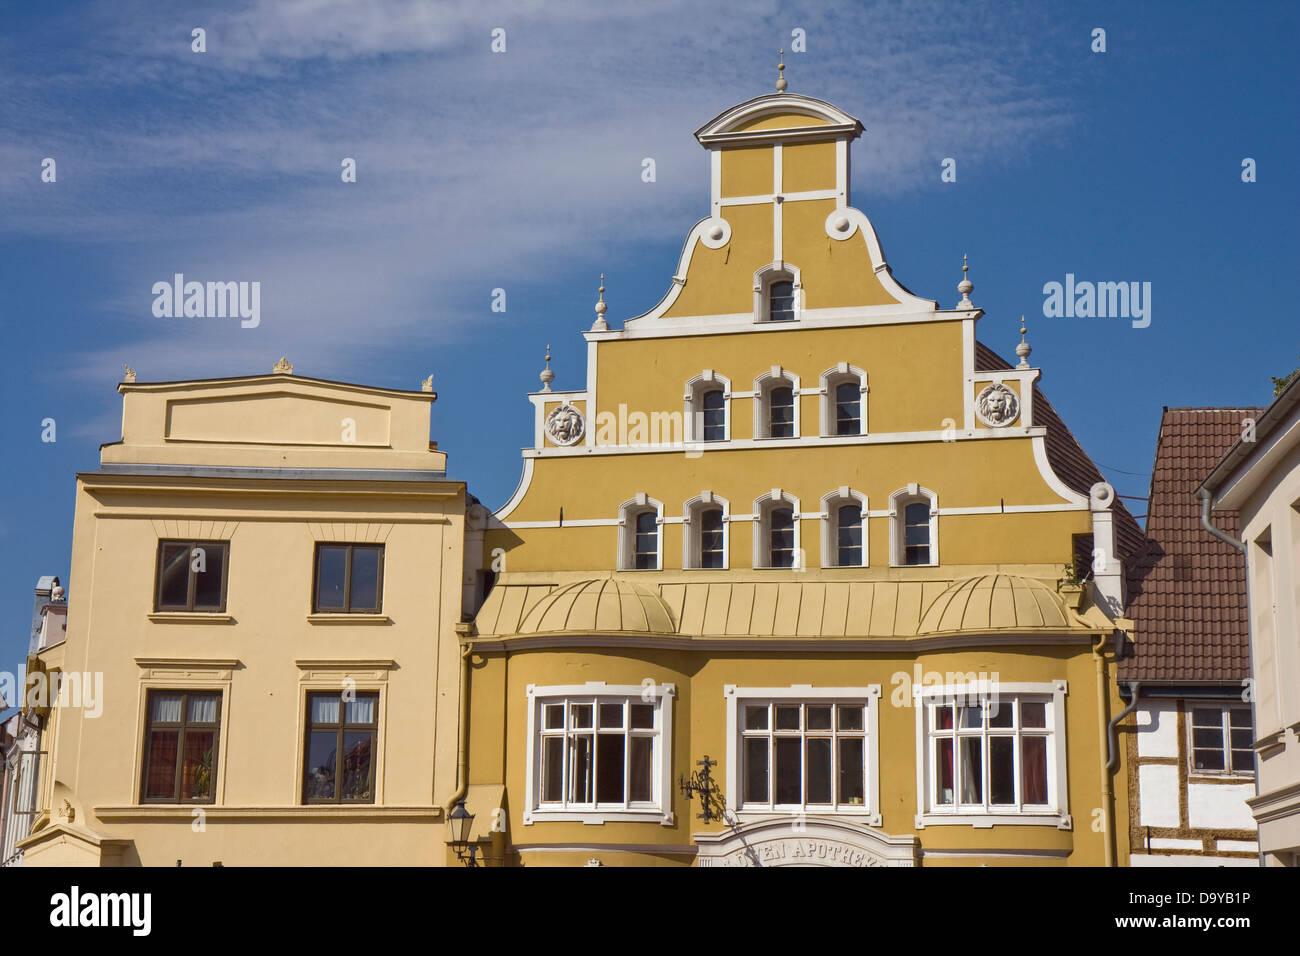 Europe, Germany, Mecklenburg-Western Pomerania, Wismar, old gable houses - Stock Image